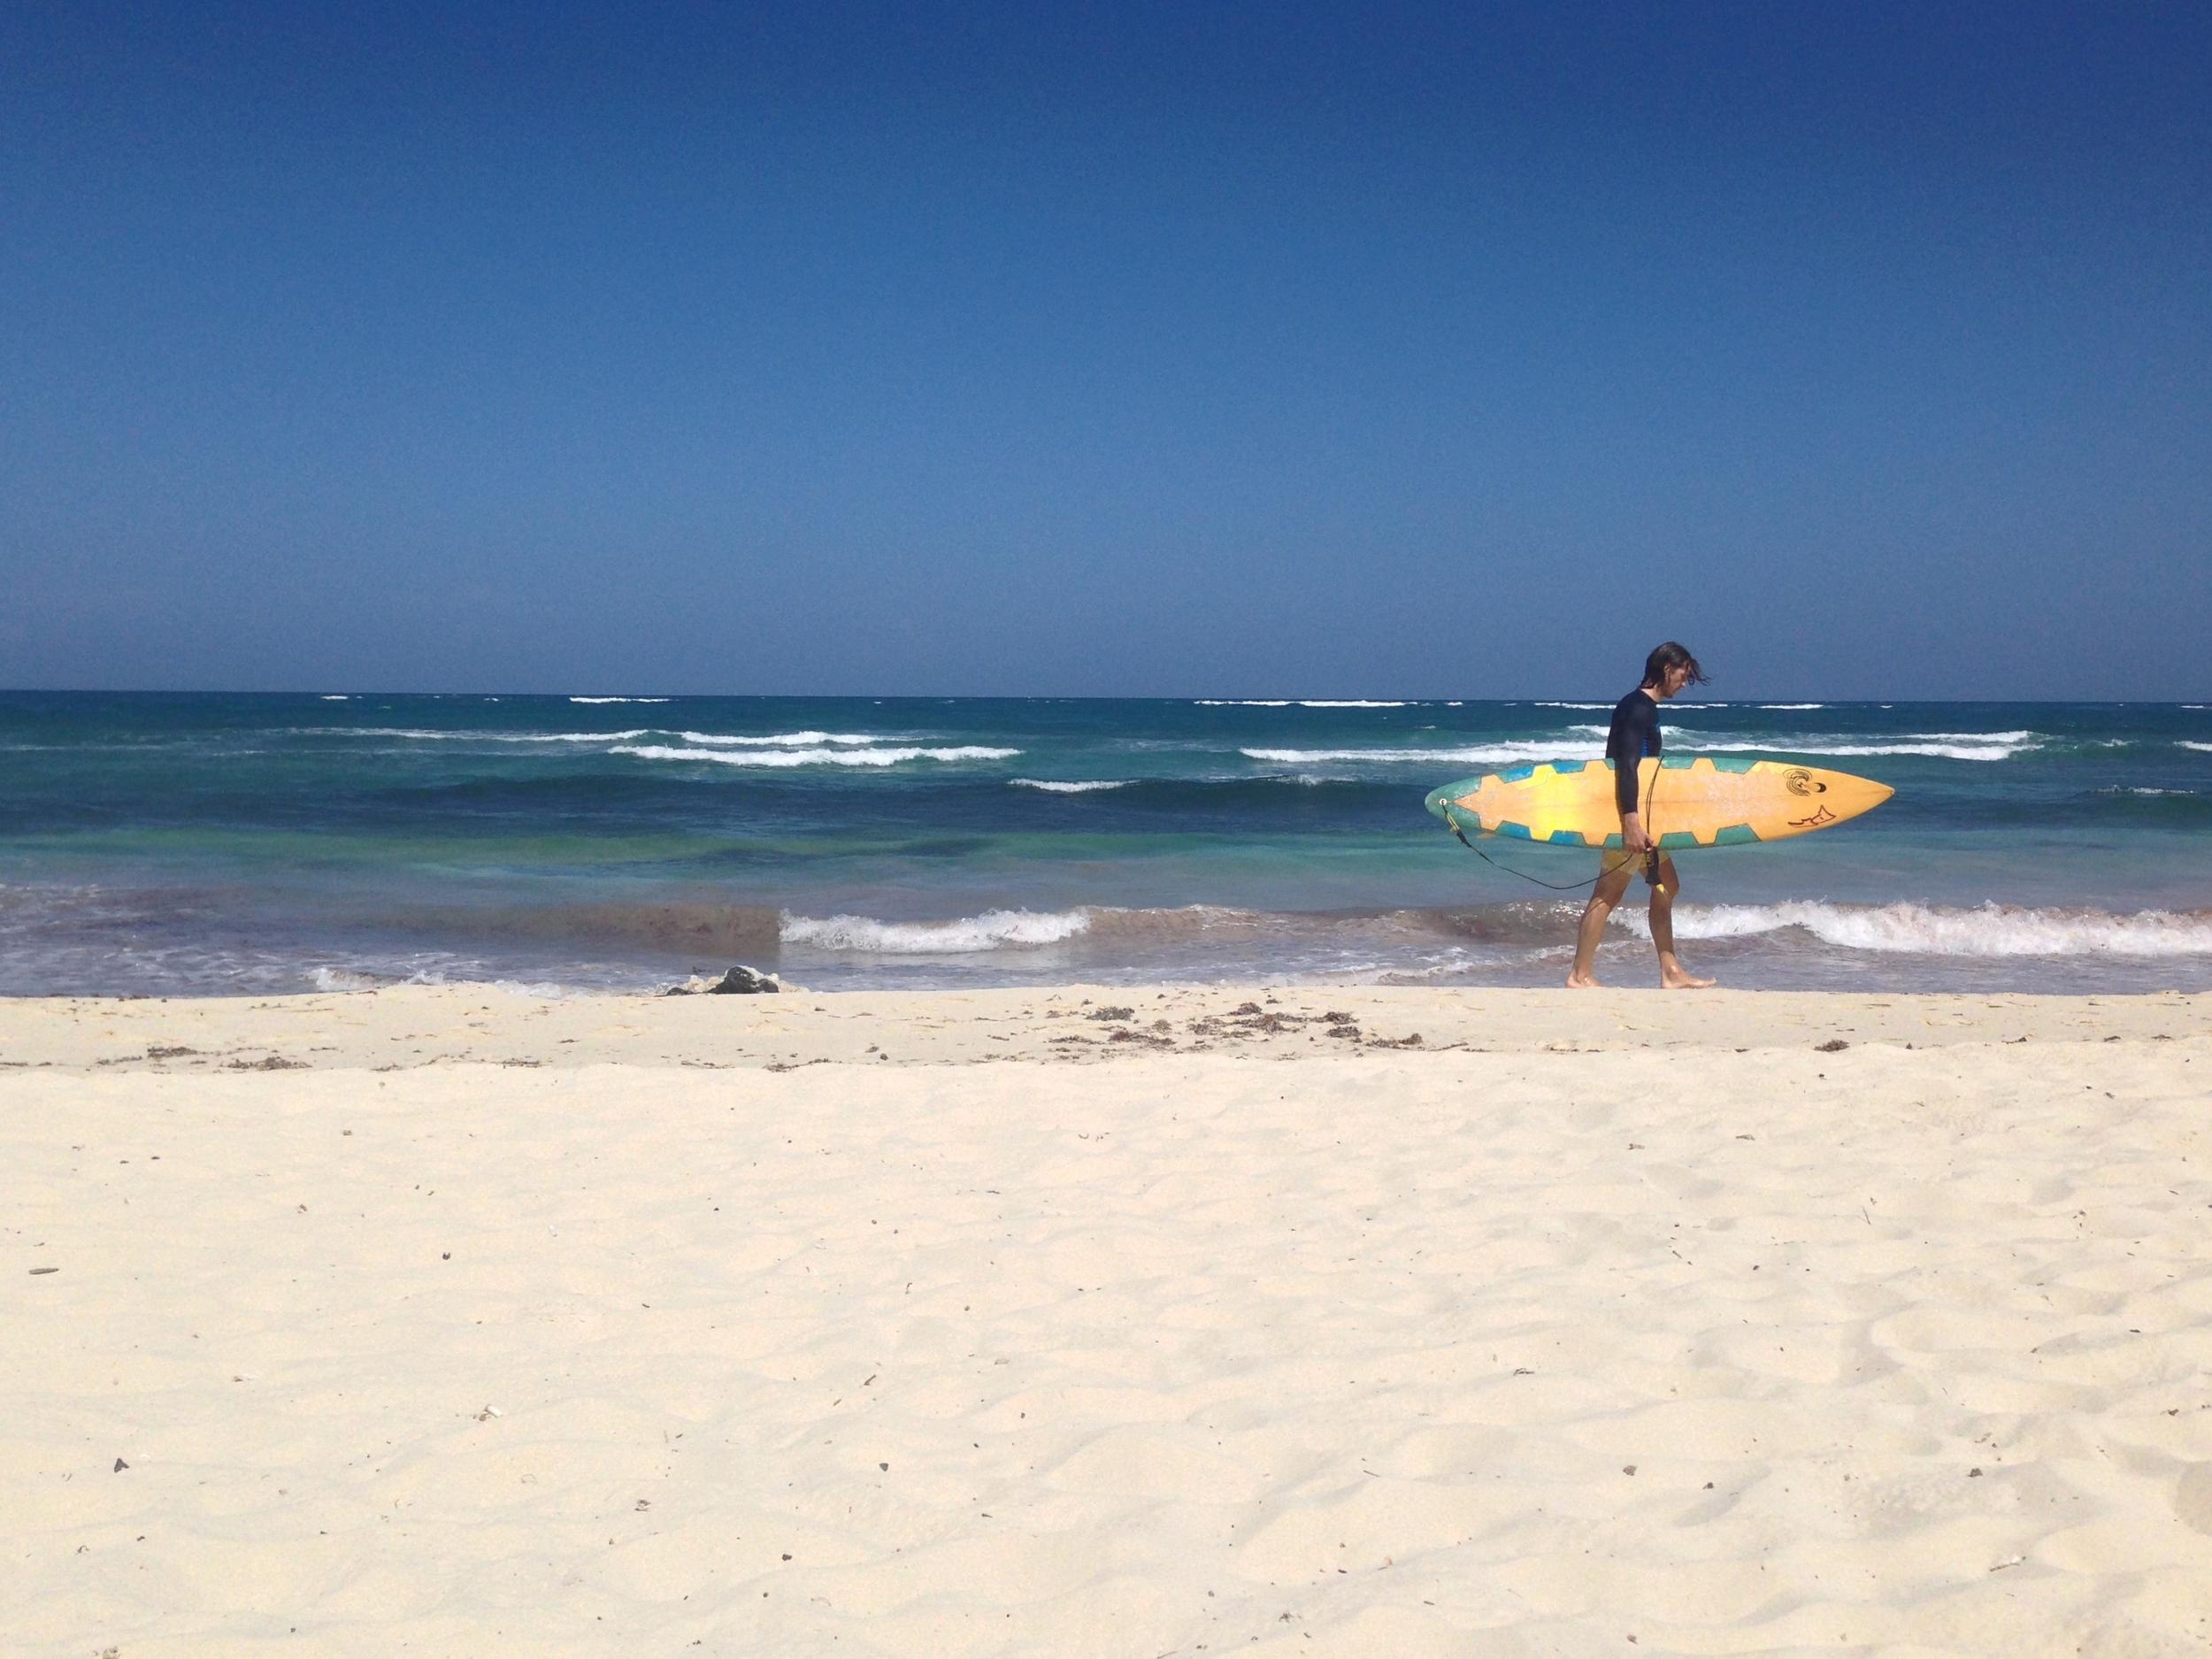 Mr. Trip Styler post-surf